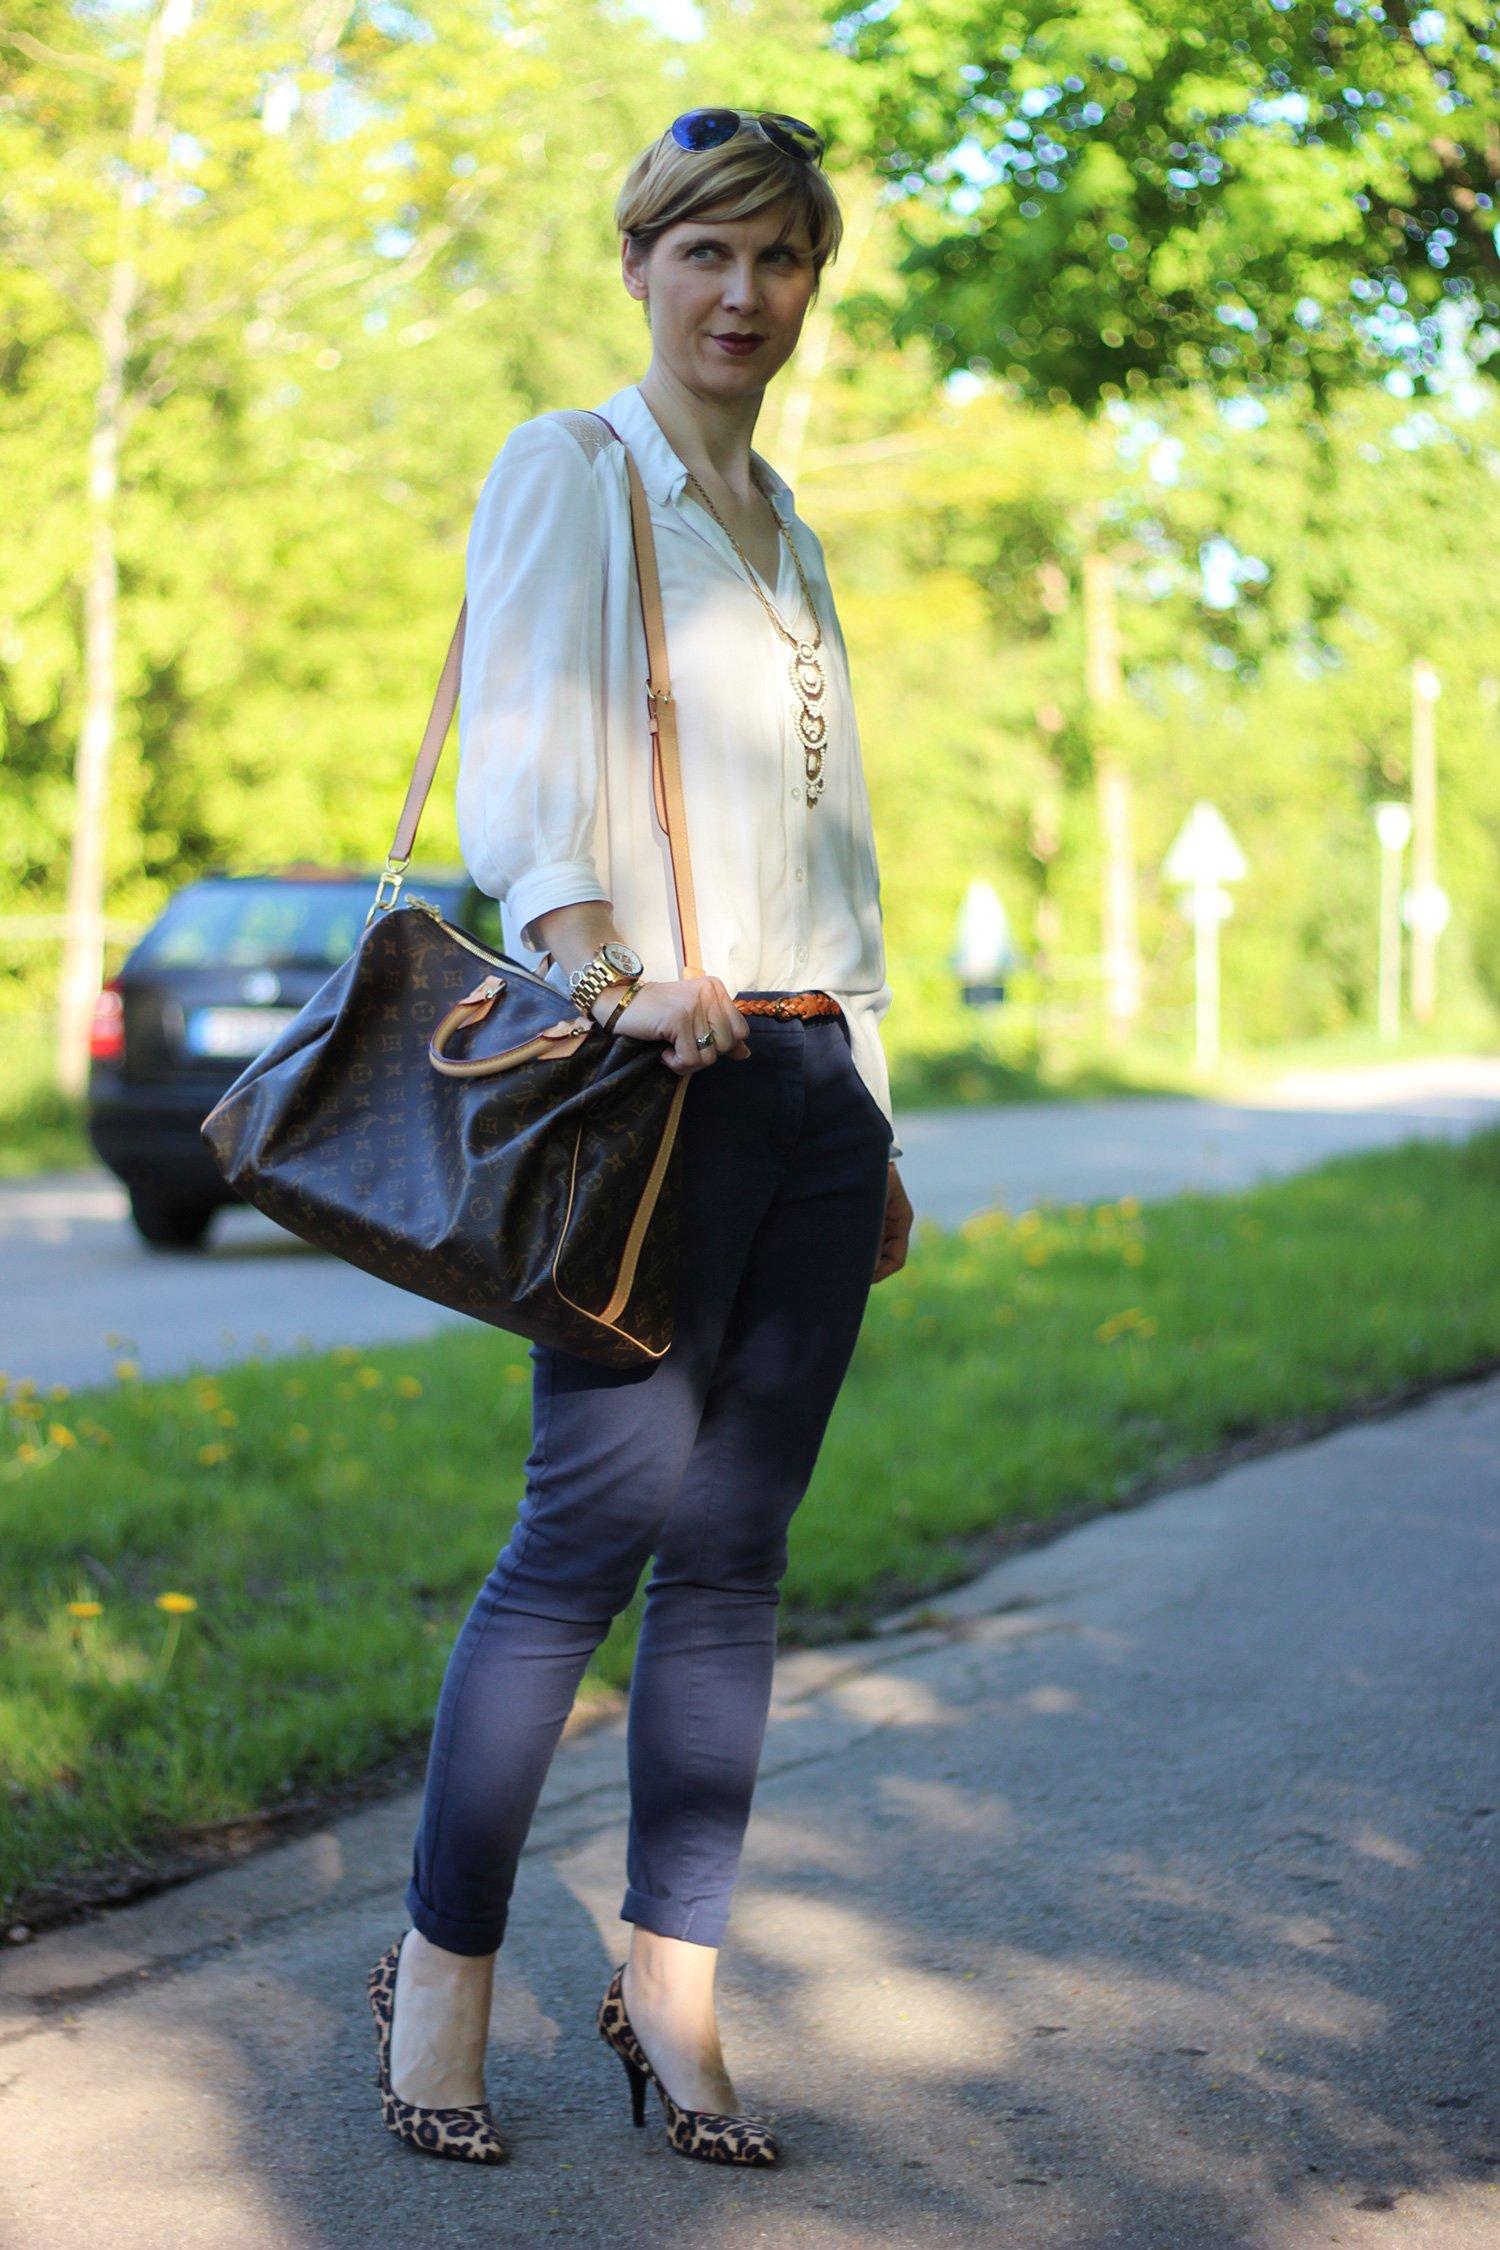 IMG_4130a_leo_leopumps_blue_blau_Lace_Spitze_Bluse_Stellaanddot_Outfit_AHemadundaHos_Conny_Fashion_Modeblog_Escada